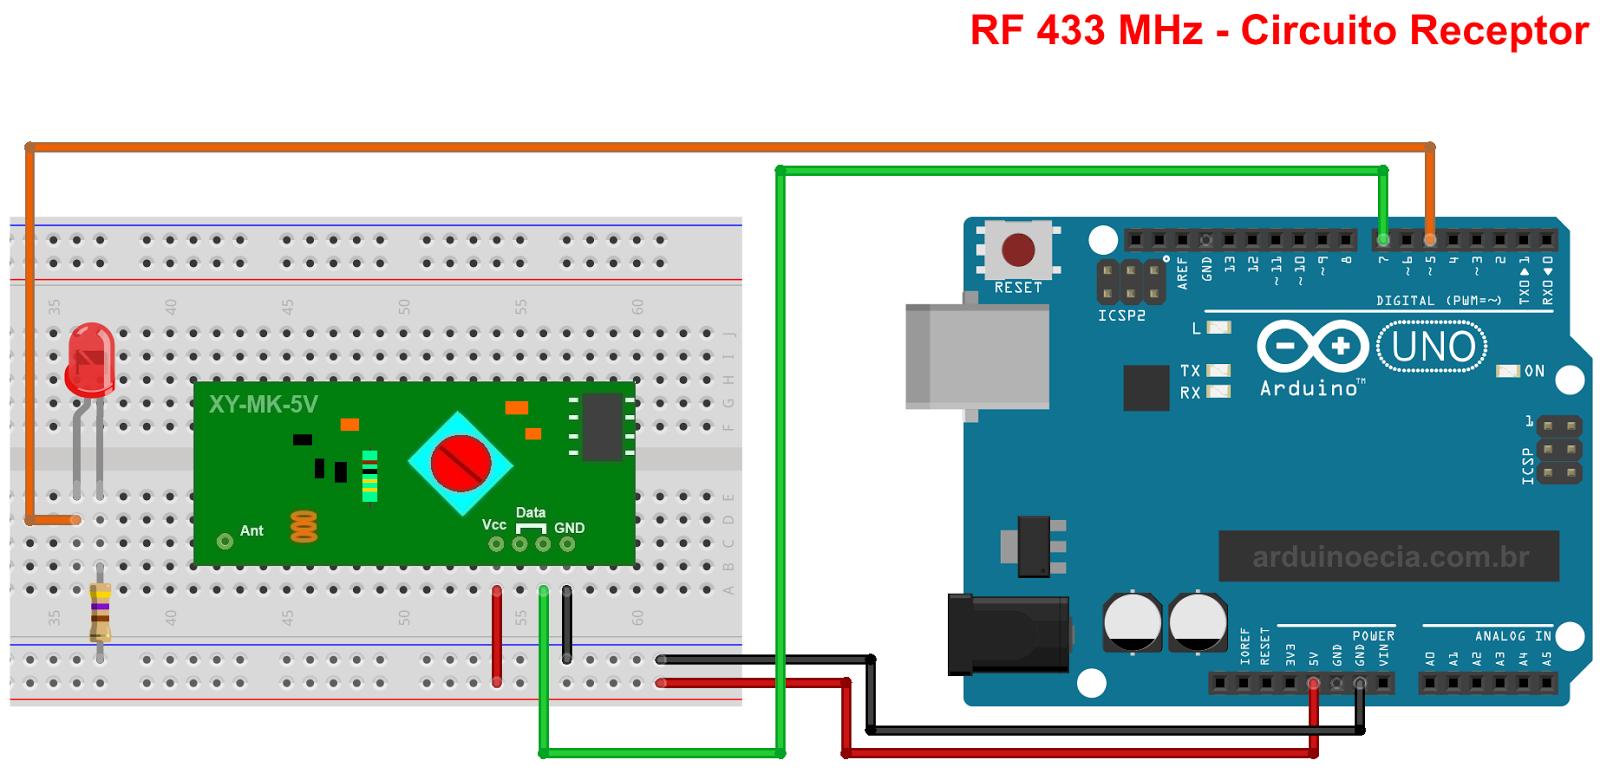 Circuito Arduino Módulo RF 433 MHz - Receptor